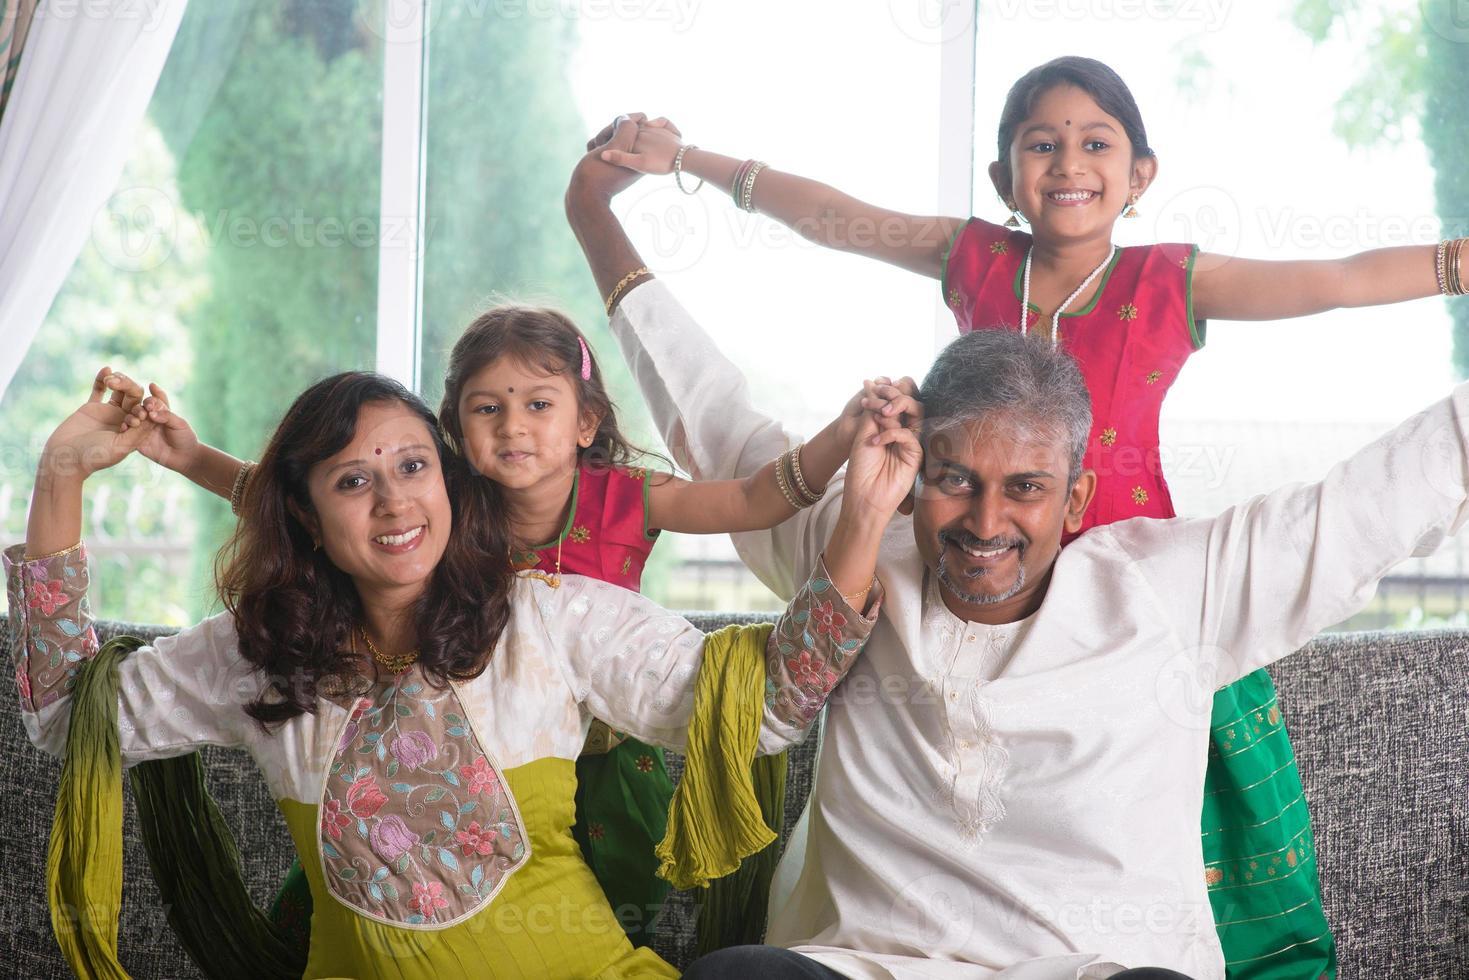 felice famiglia indiana a casa foto